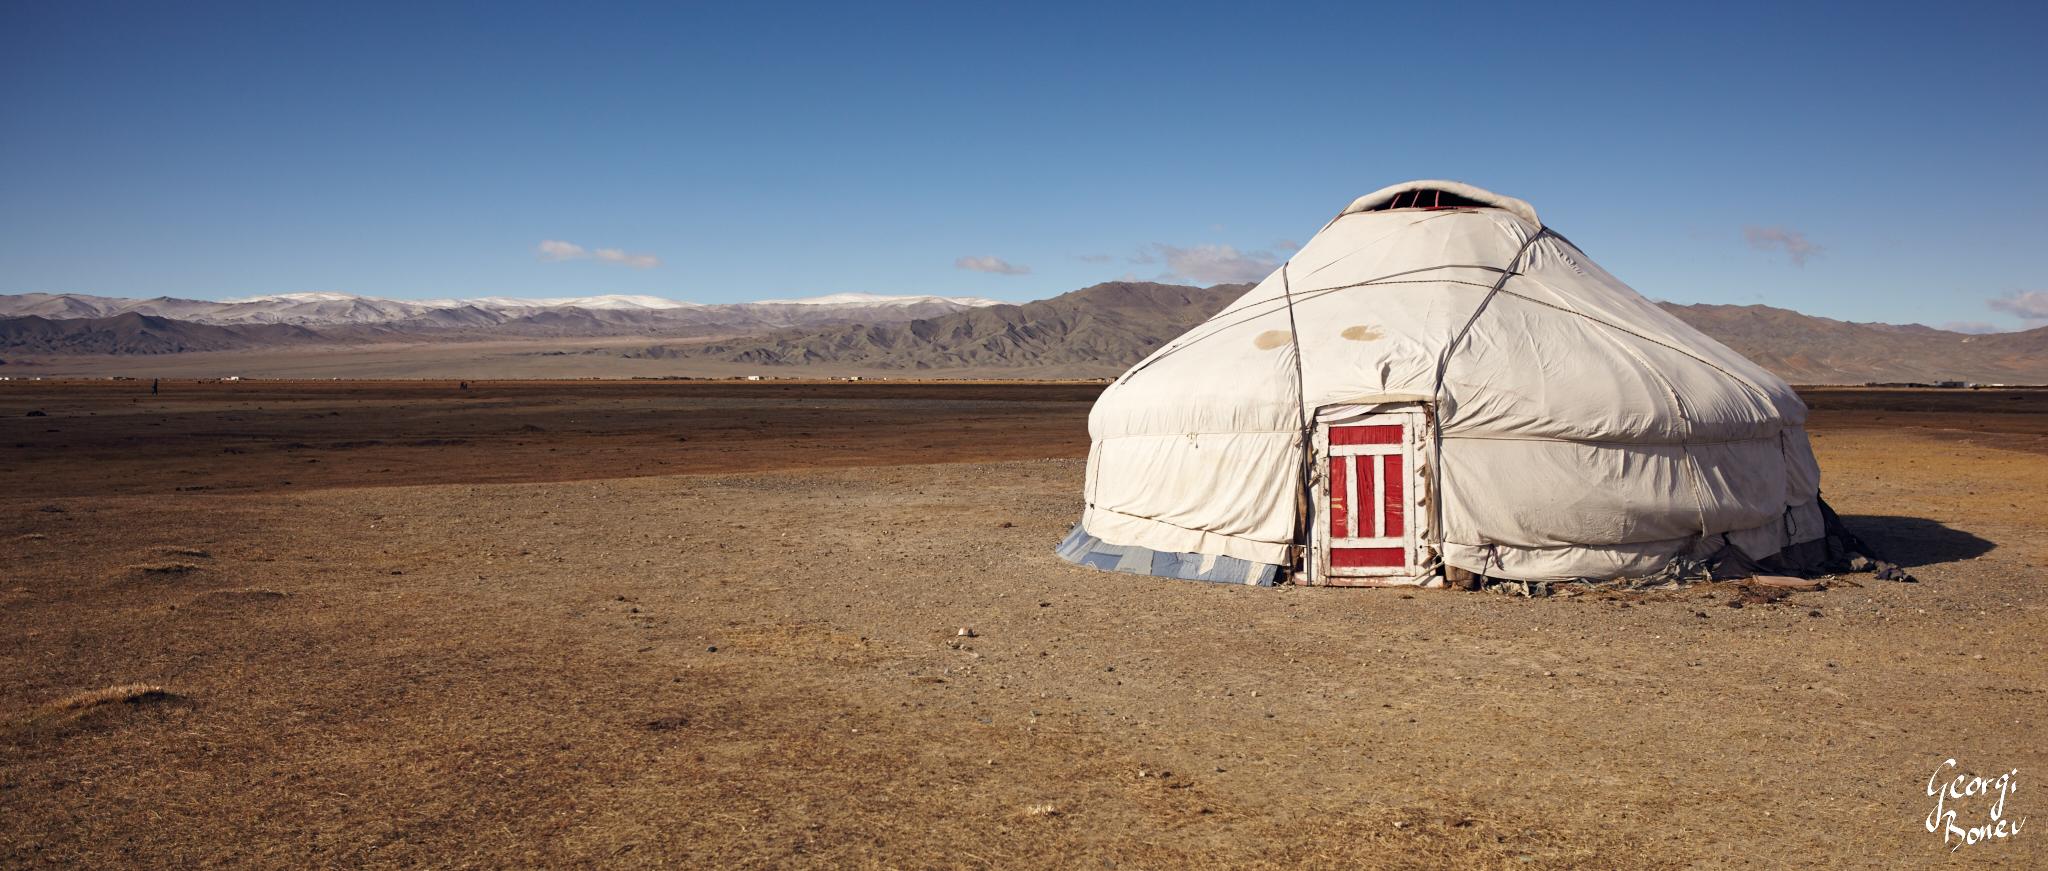 Gerr in Altai Mountain